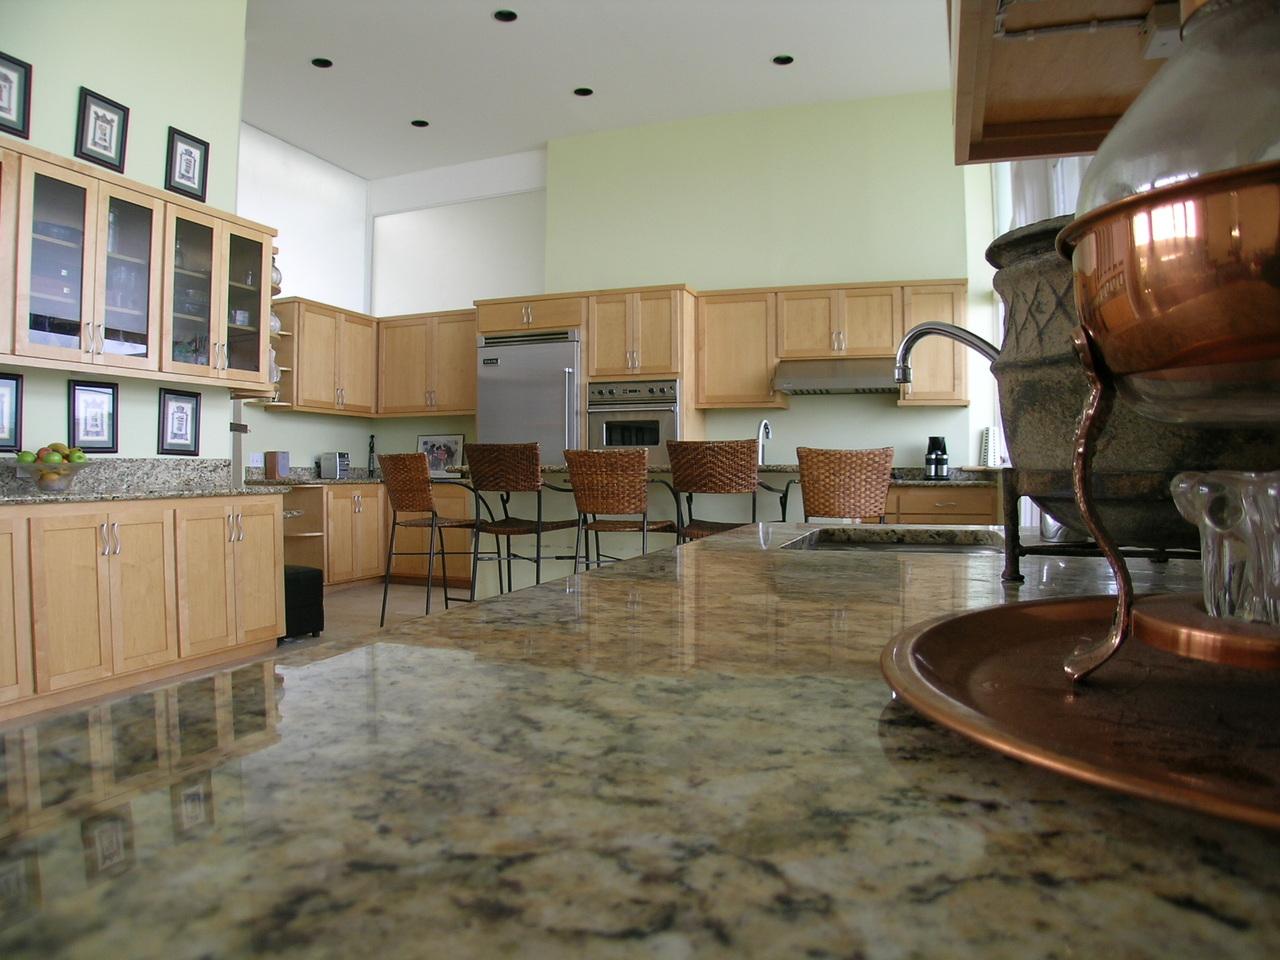 a modern looking kitchen